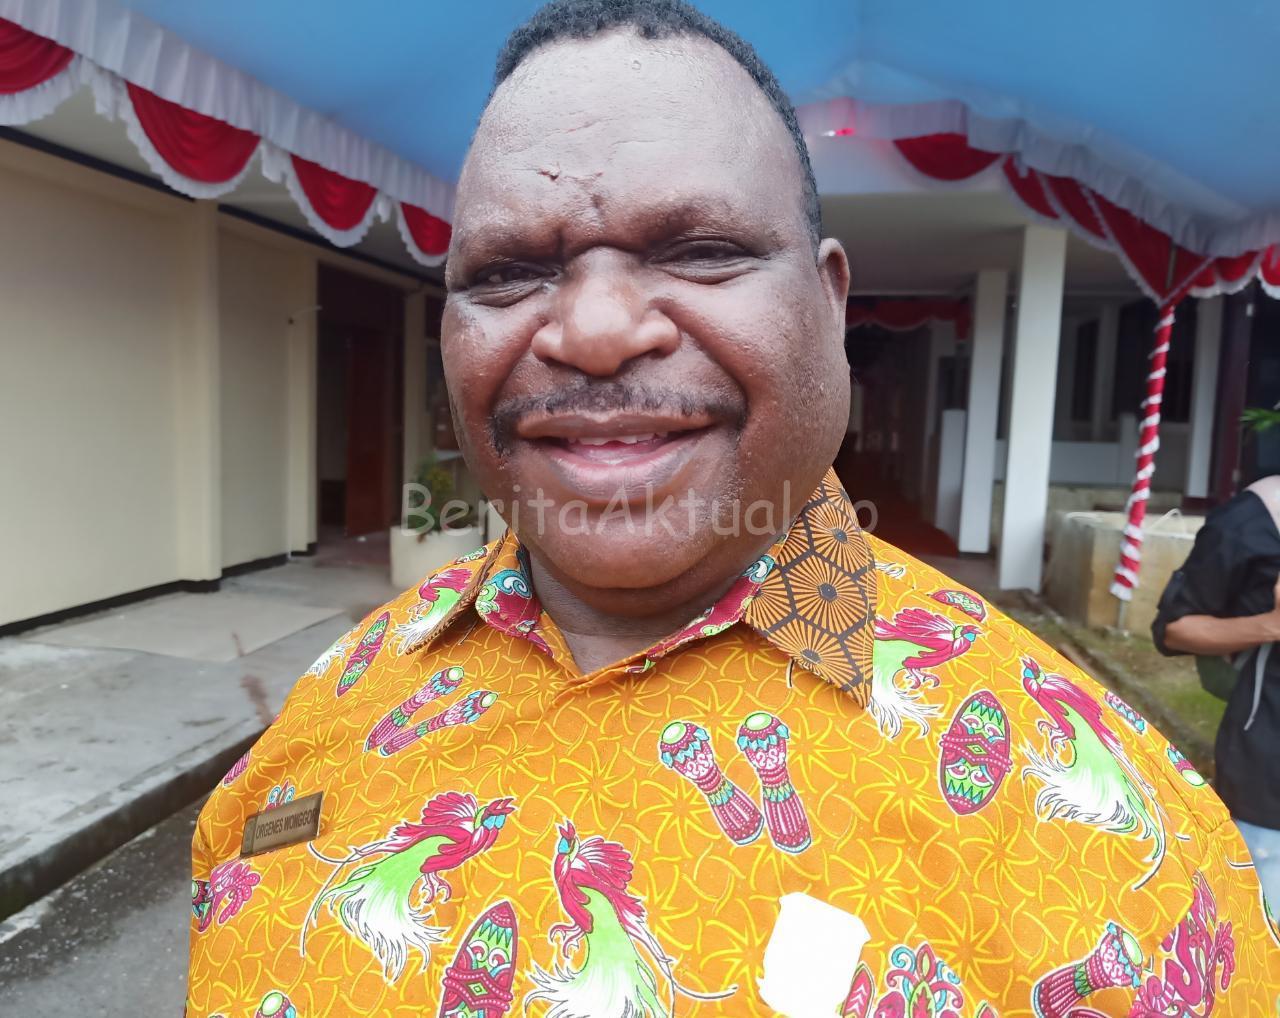 Ketua DPR Papua Barat Relokasi Anggaran Dewan Rp10,5 Miliar Cegah Covid-19 15 IMG 20200414 WA0078